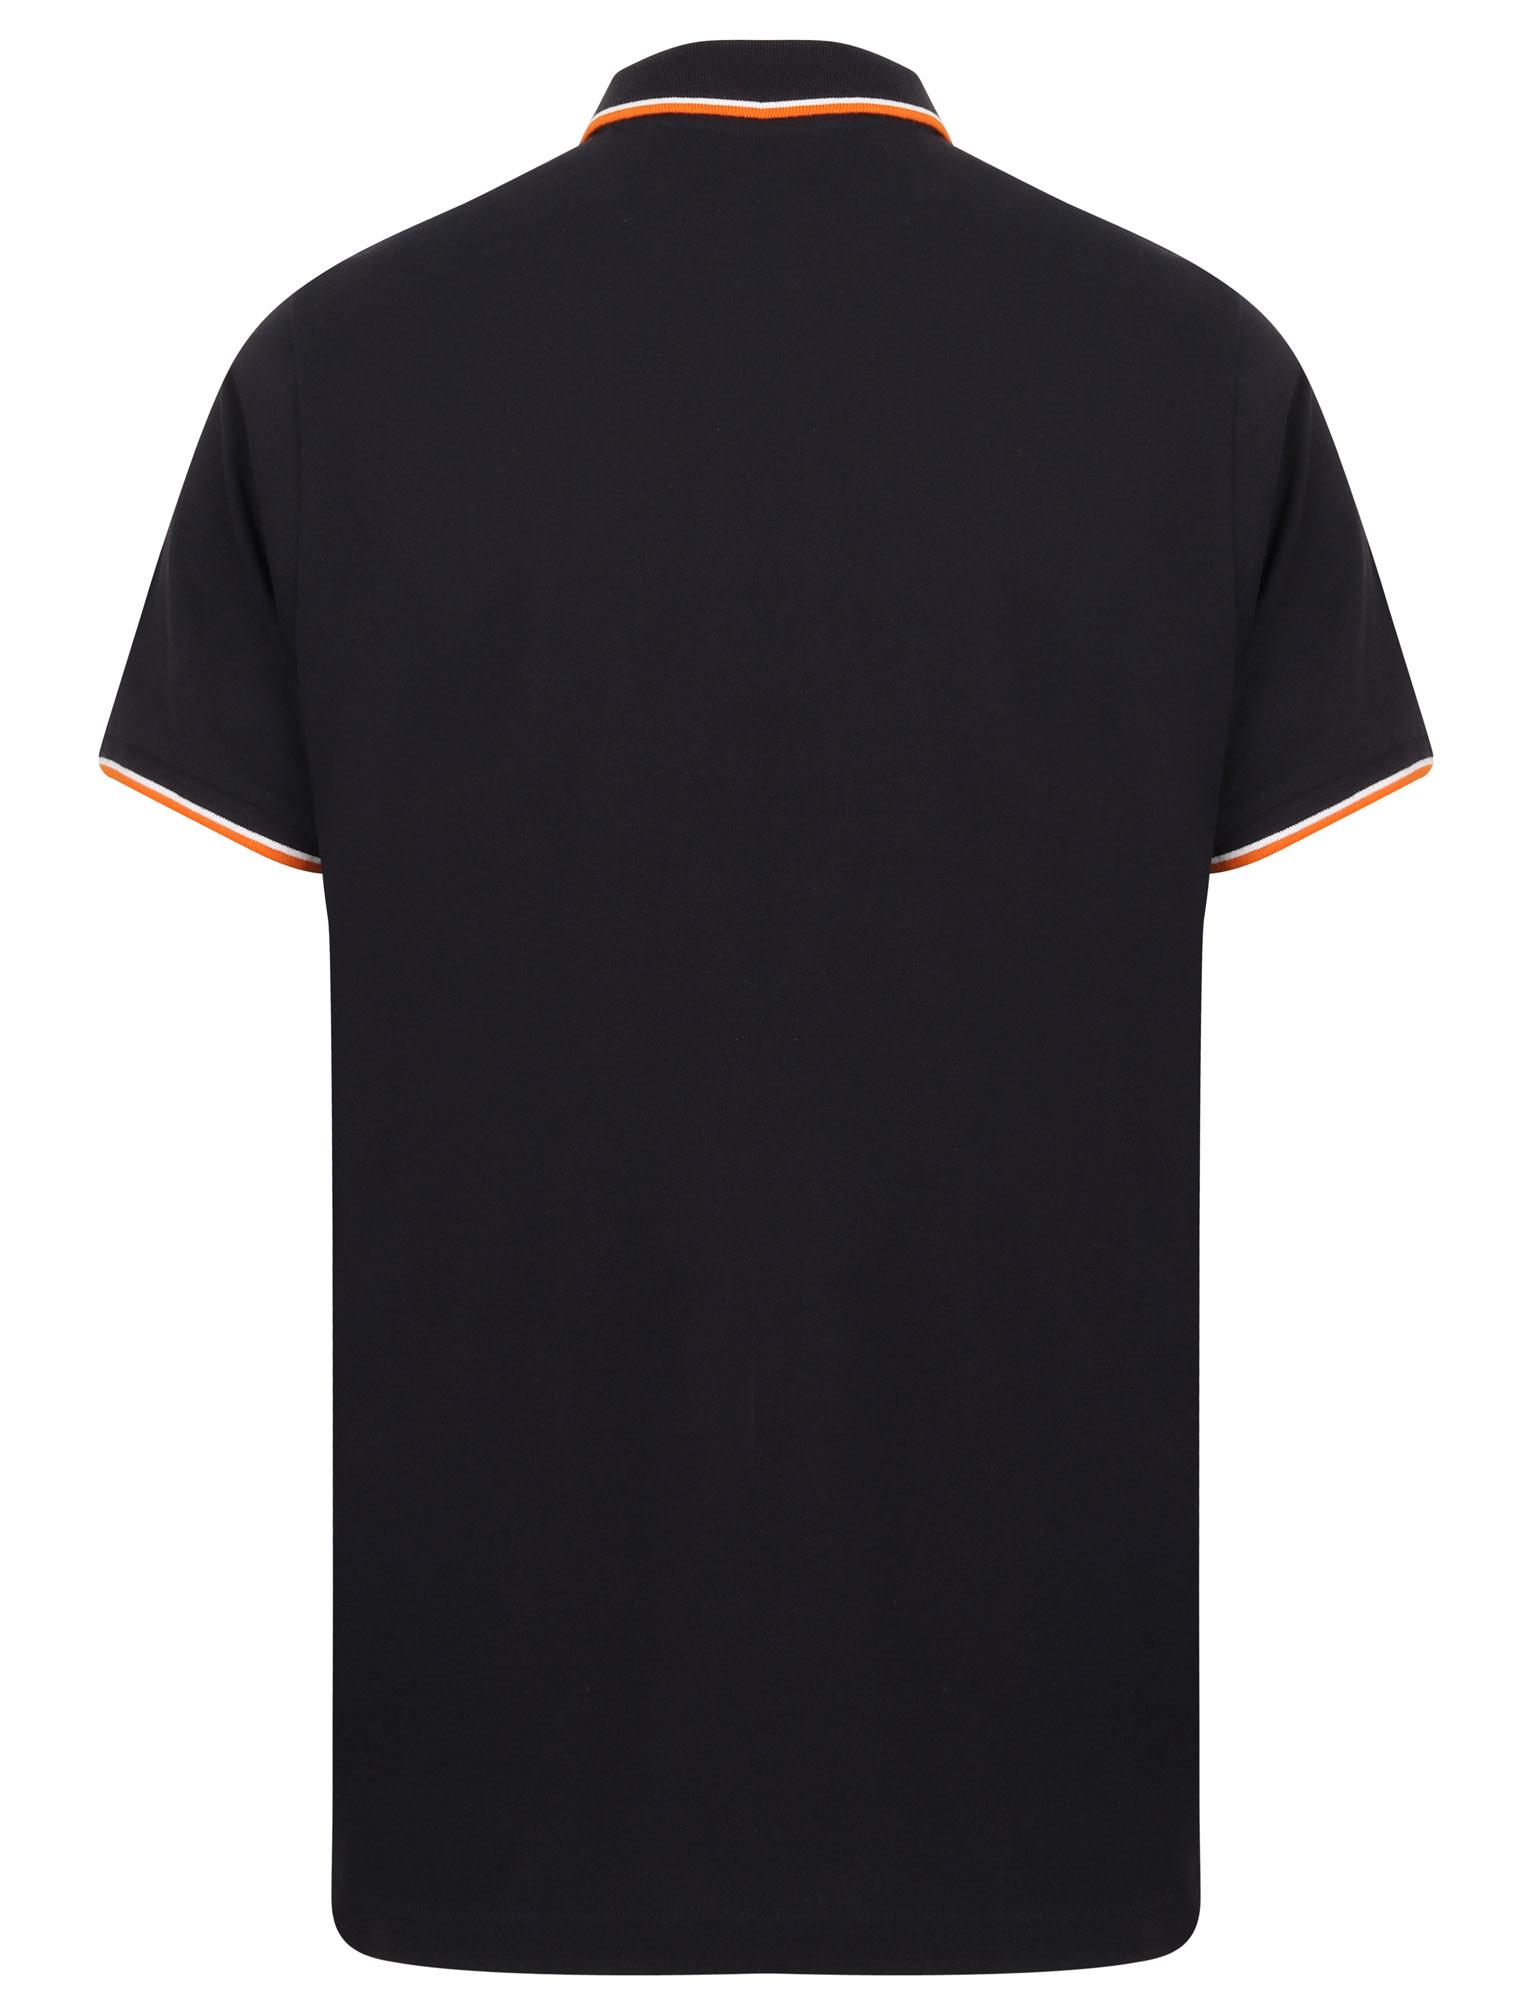 Sth-Shore-Mens-Plain-Polo-Shirt-100-Pique-Cotton-T-Shirt-Top-Collar-Size-M-XXL thumbnail 3